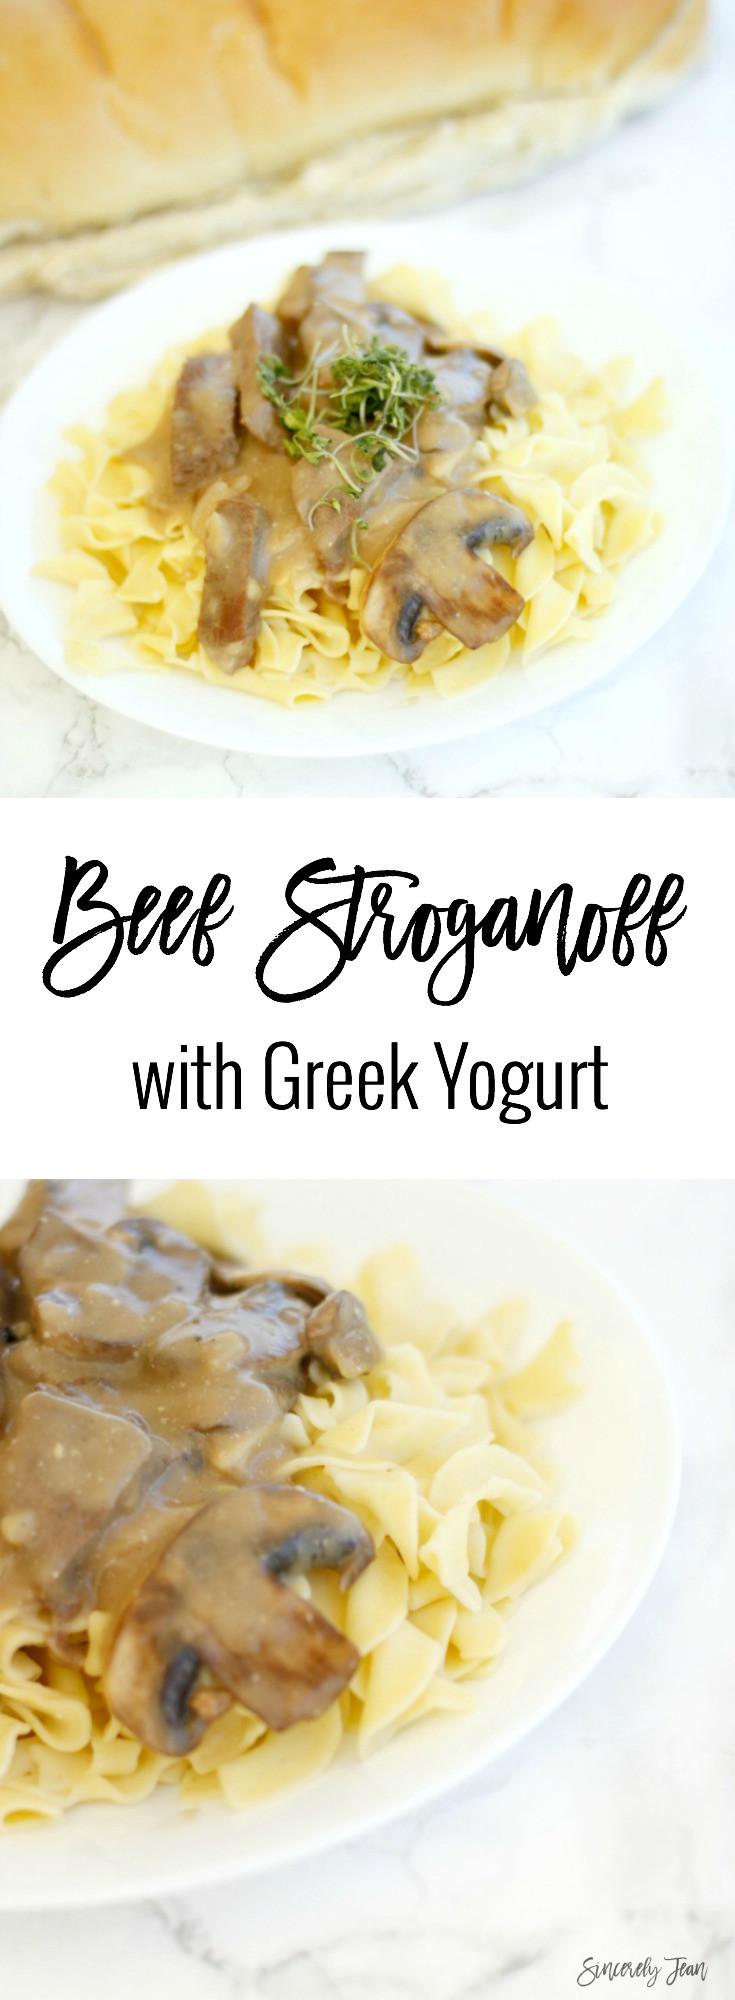 Healthy Beef Stroganoff With Greek Yogurt  Beef Stroganoff with Greek Yogurt Sincerely Jean